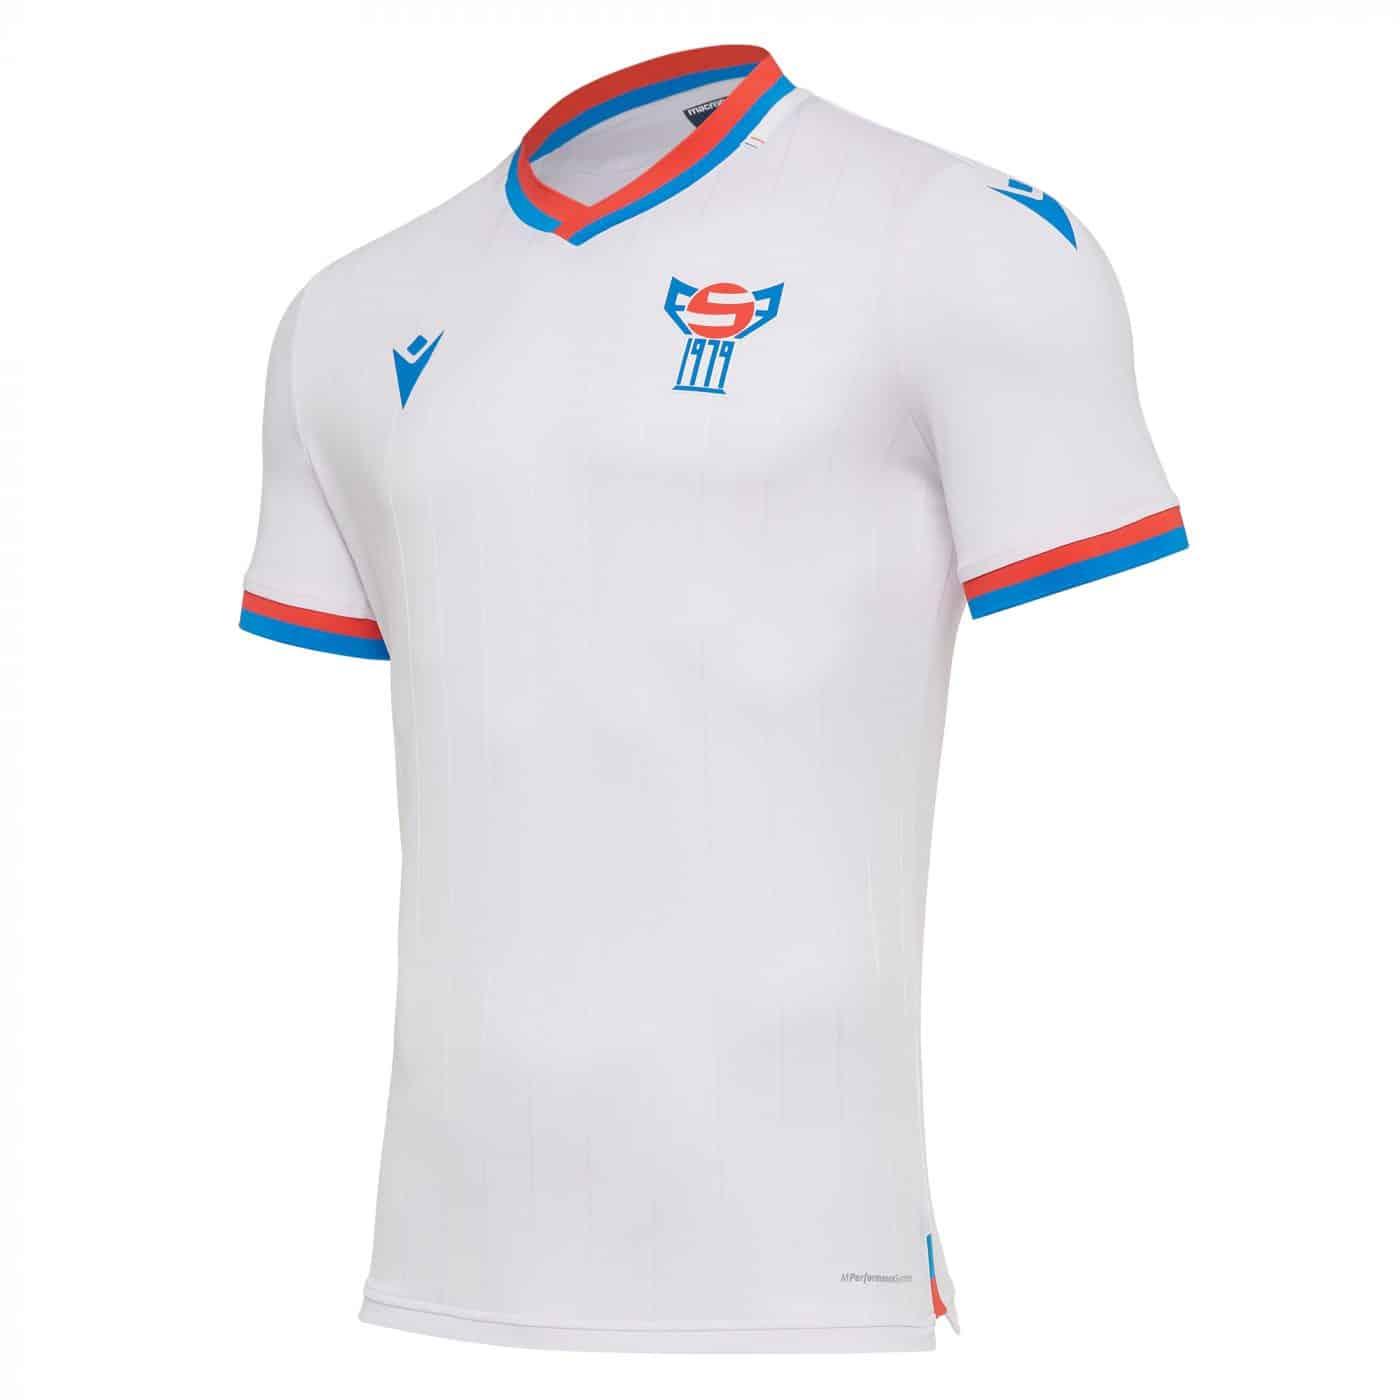 maillot-domicile-iles-feroe-2020-2021-macron-uefa-Faroe-Islands-jersey